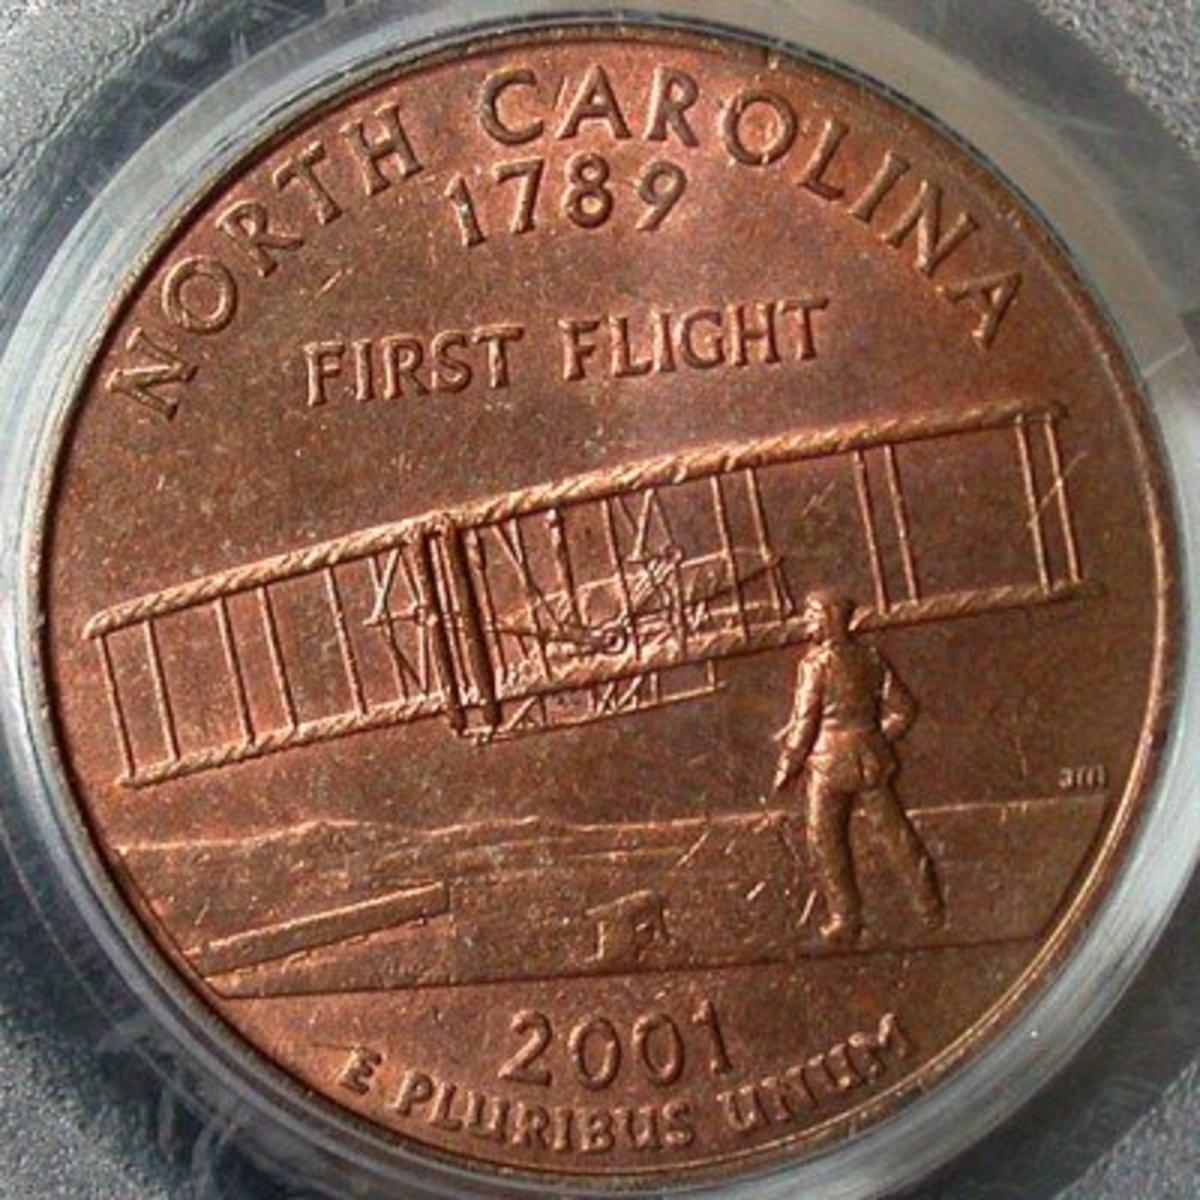 2001 North Carolina Missing Clad Layer Error. Photo Courtesy: coinpage.com